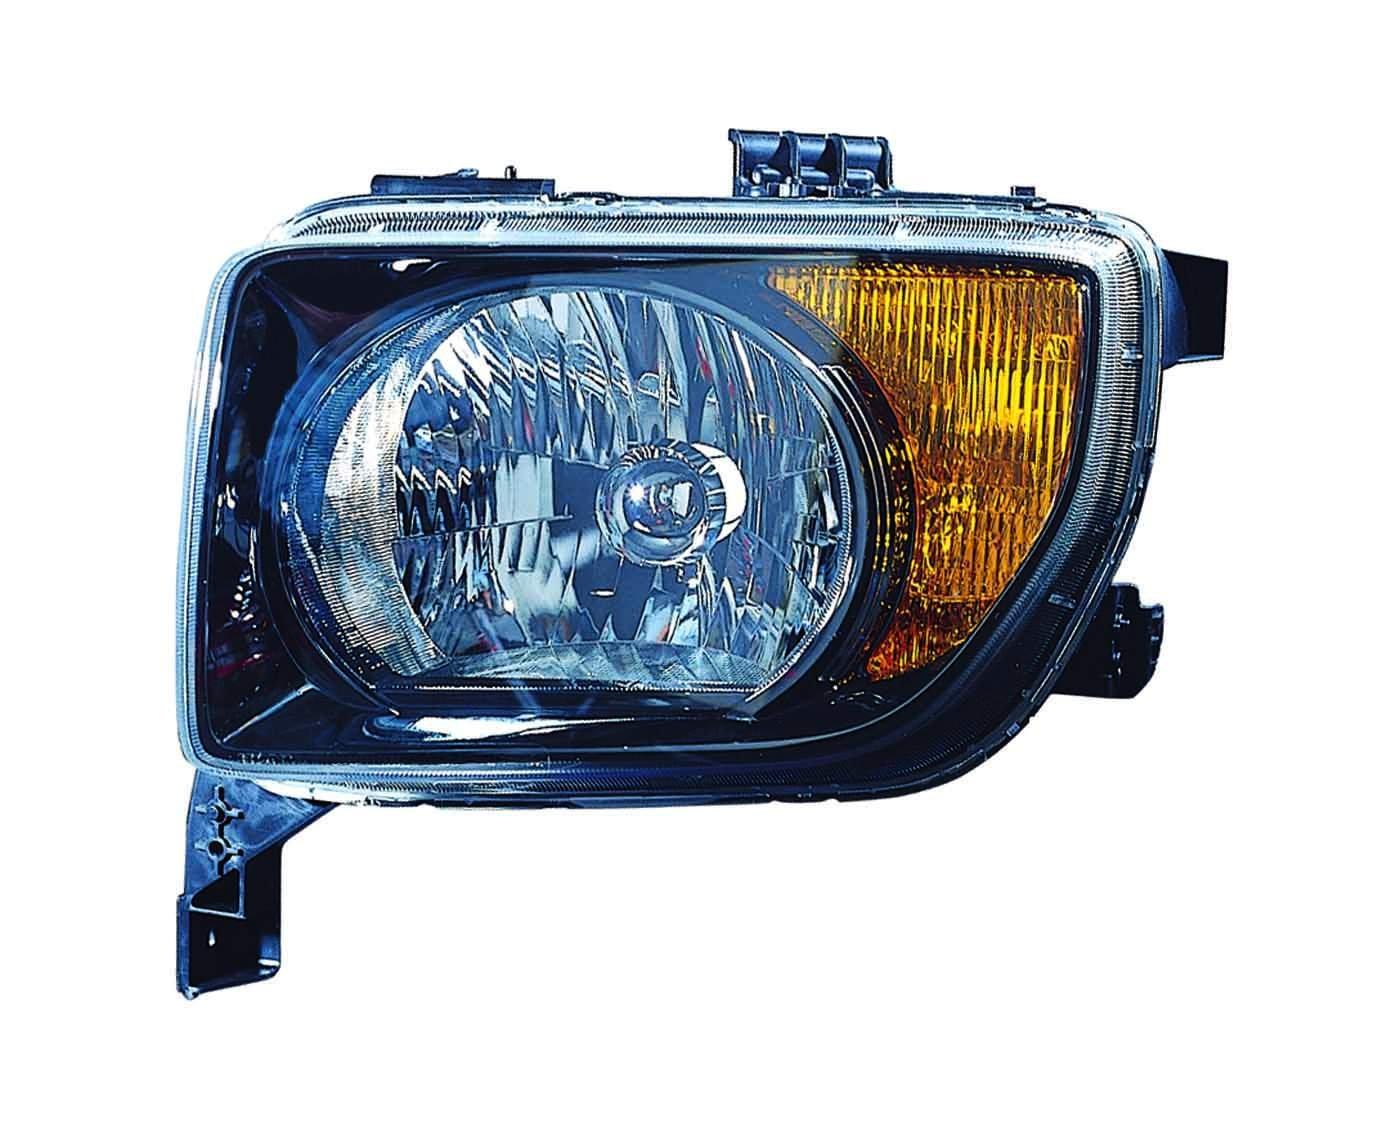 HONDA ELEMENT 07-08 UNIT EX//LX MODEL BLACK BEZEL DRIVER SIDE NSF Depo 317-1133L-UF2 Headlight